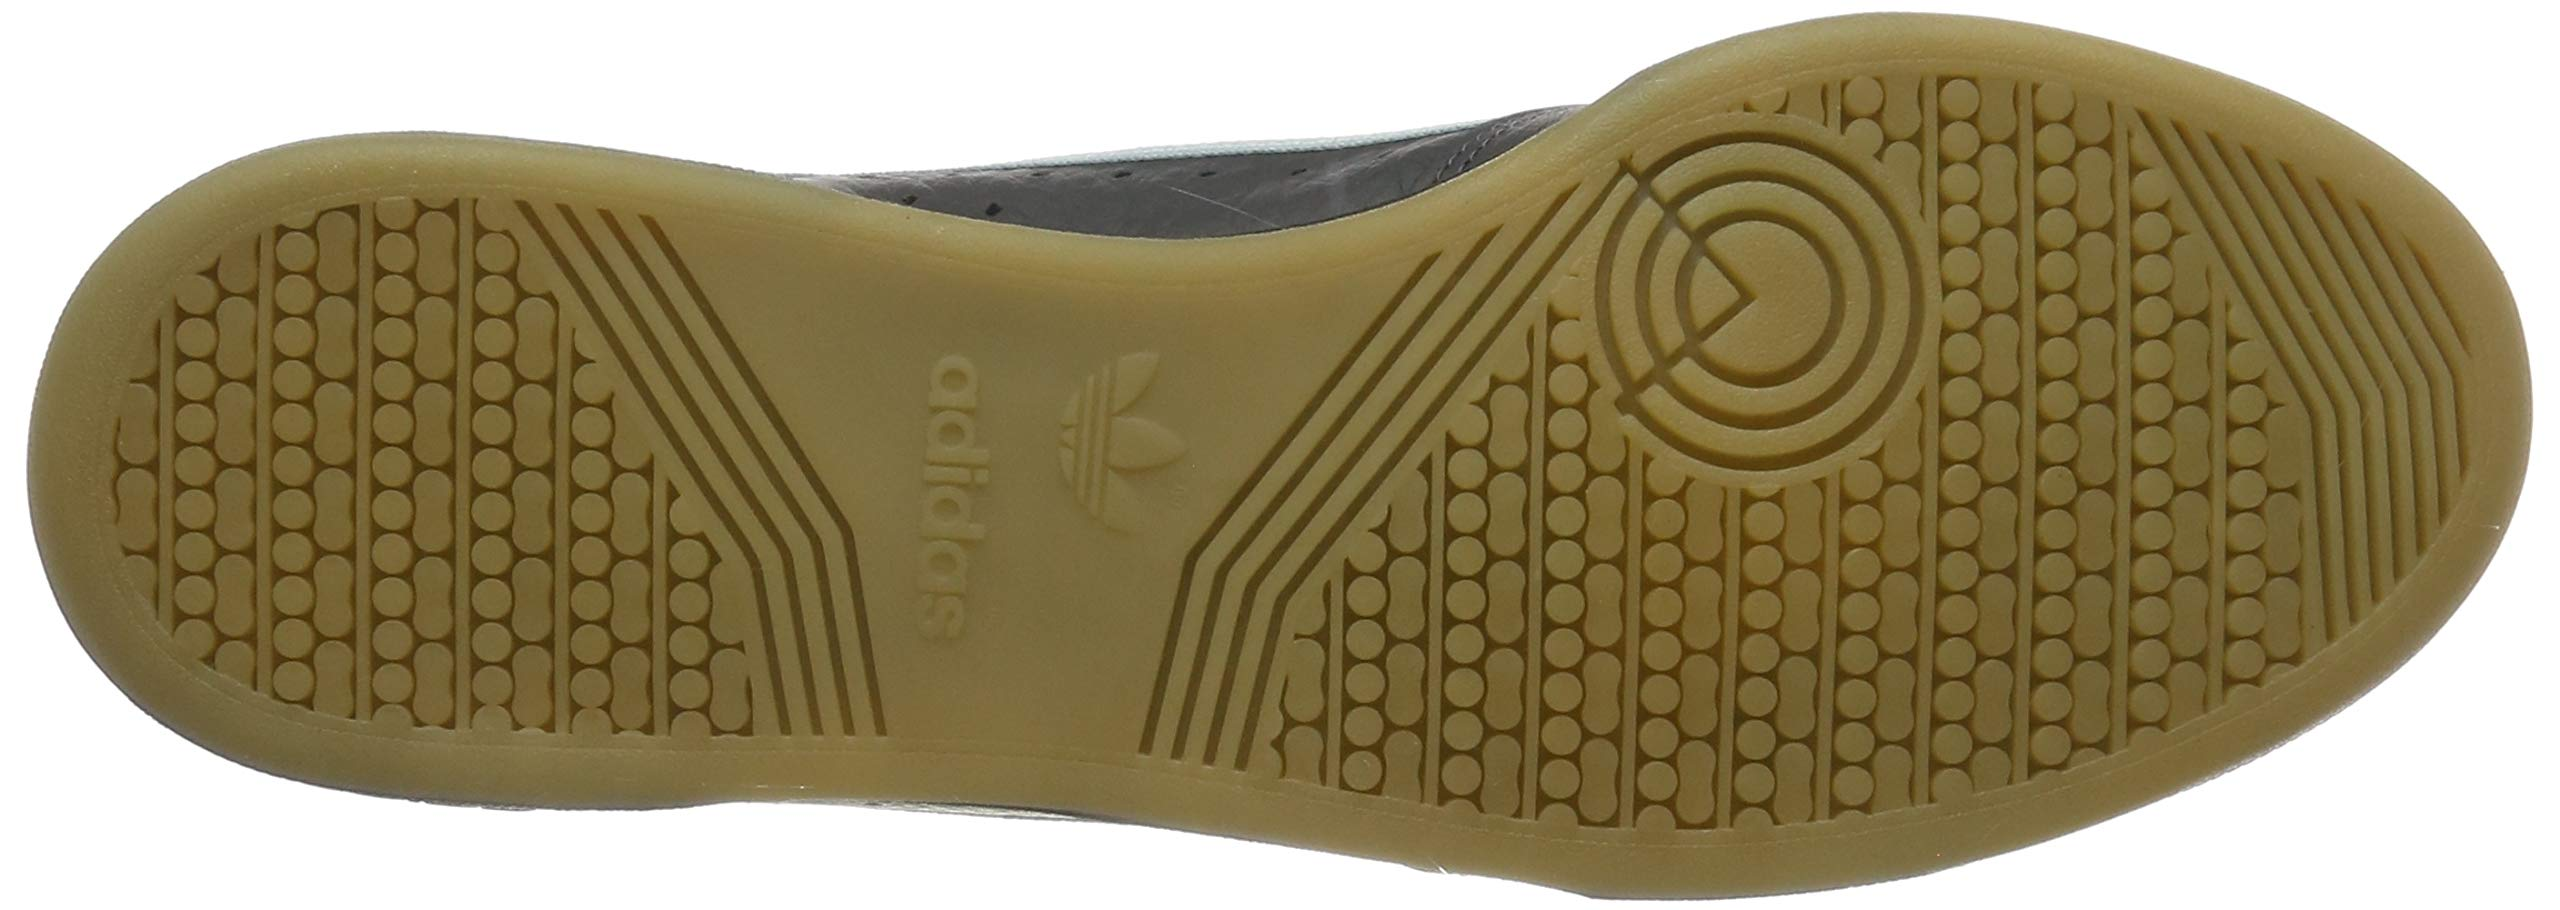 adidas Continental 80, Scarpe da Ginnastica Uomo 8 spesavip